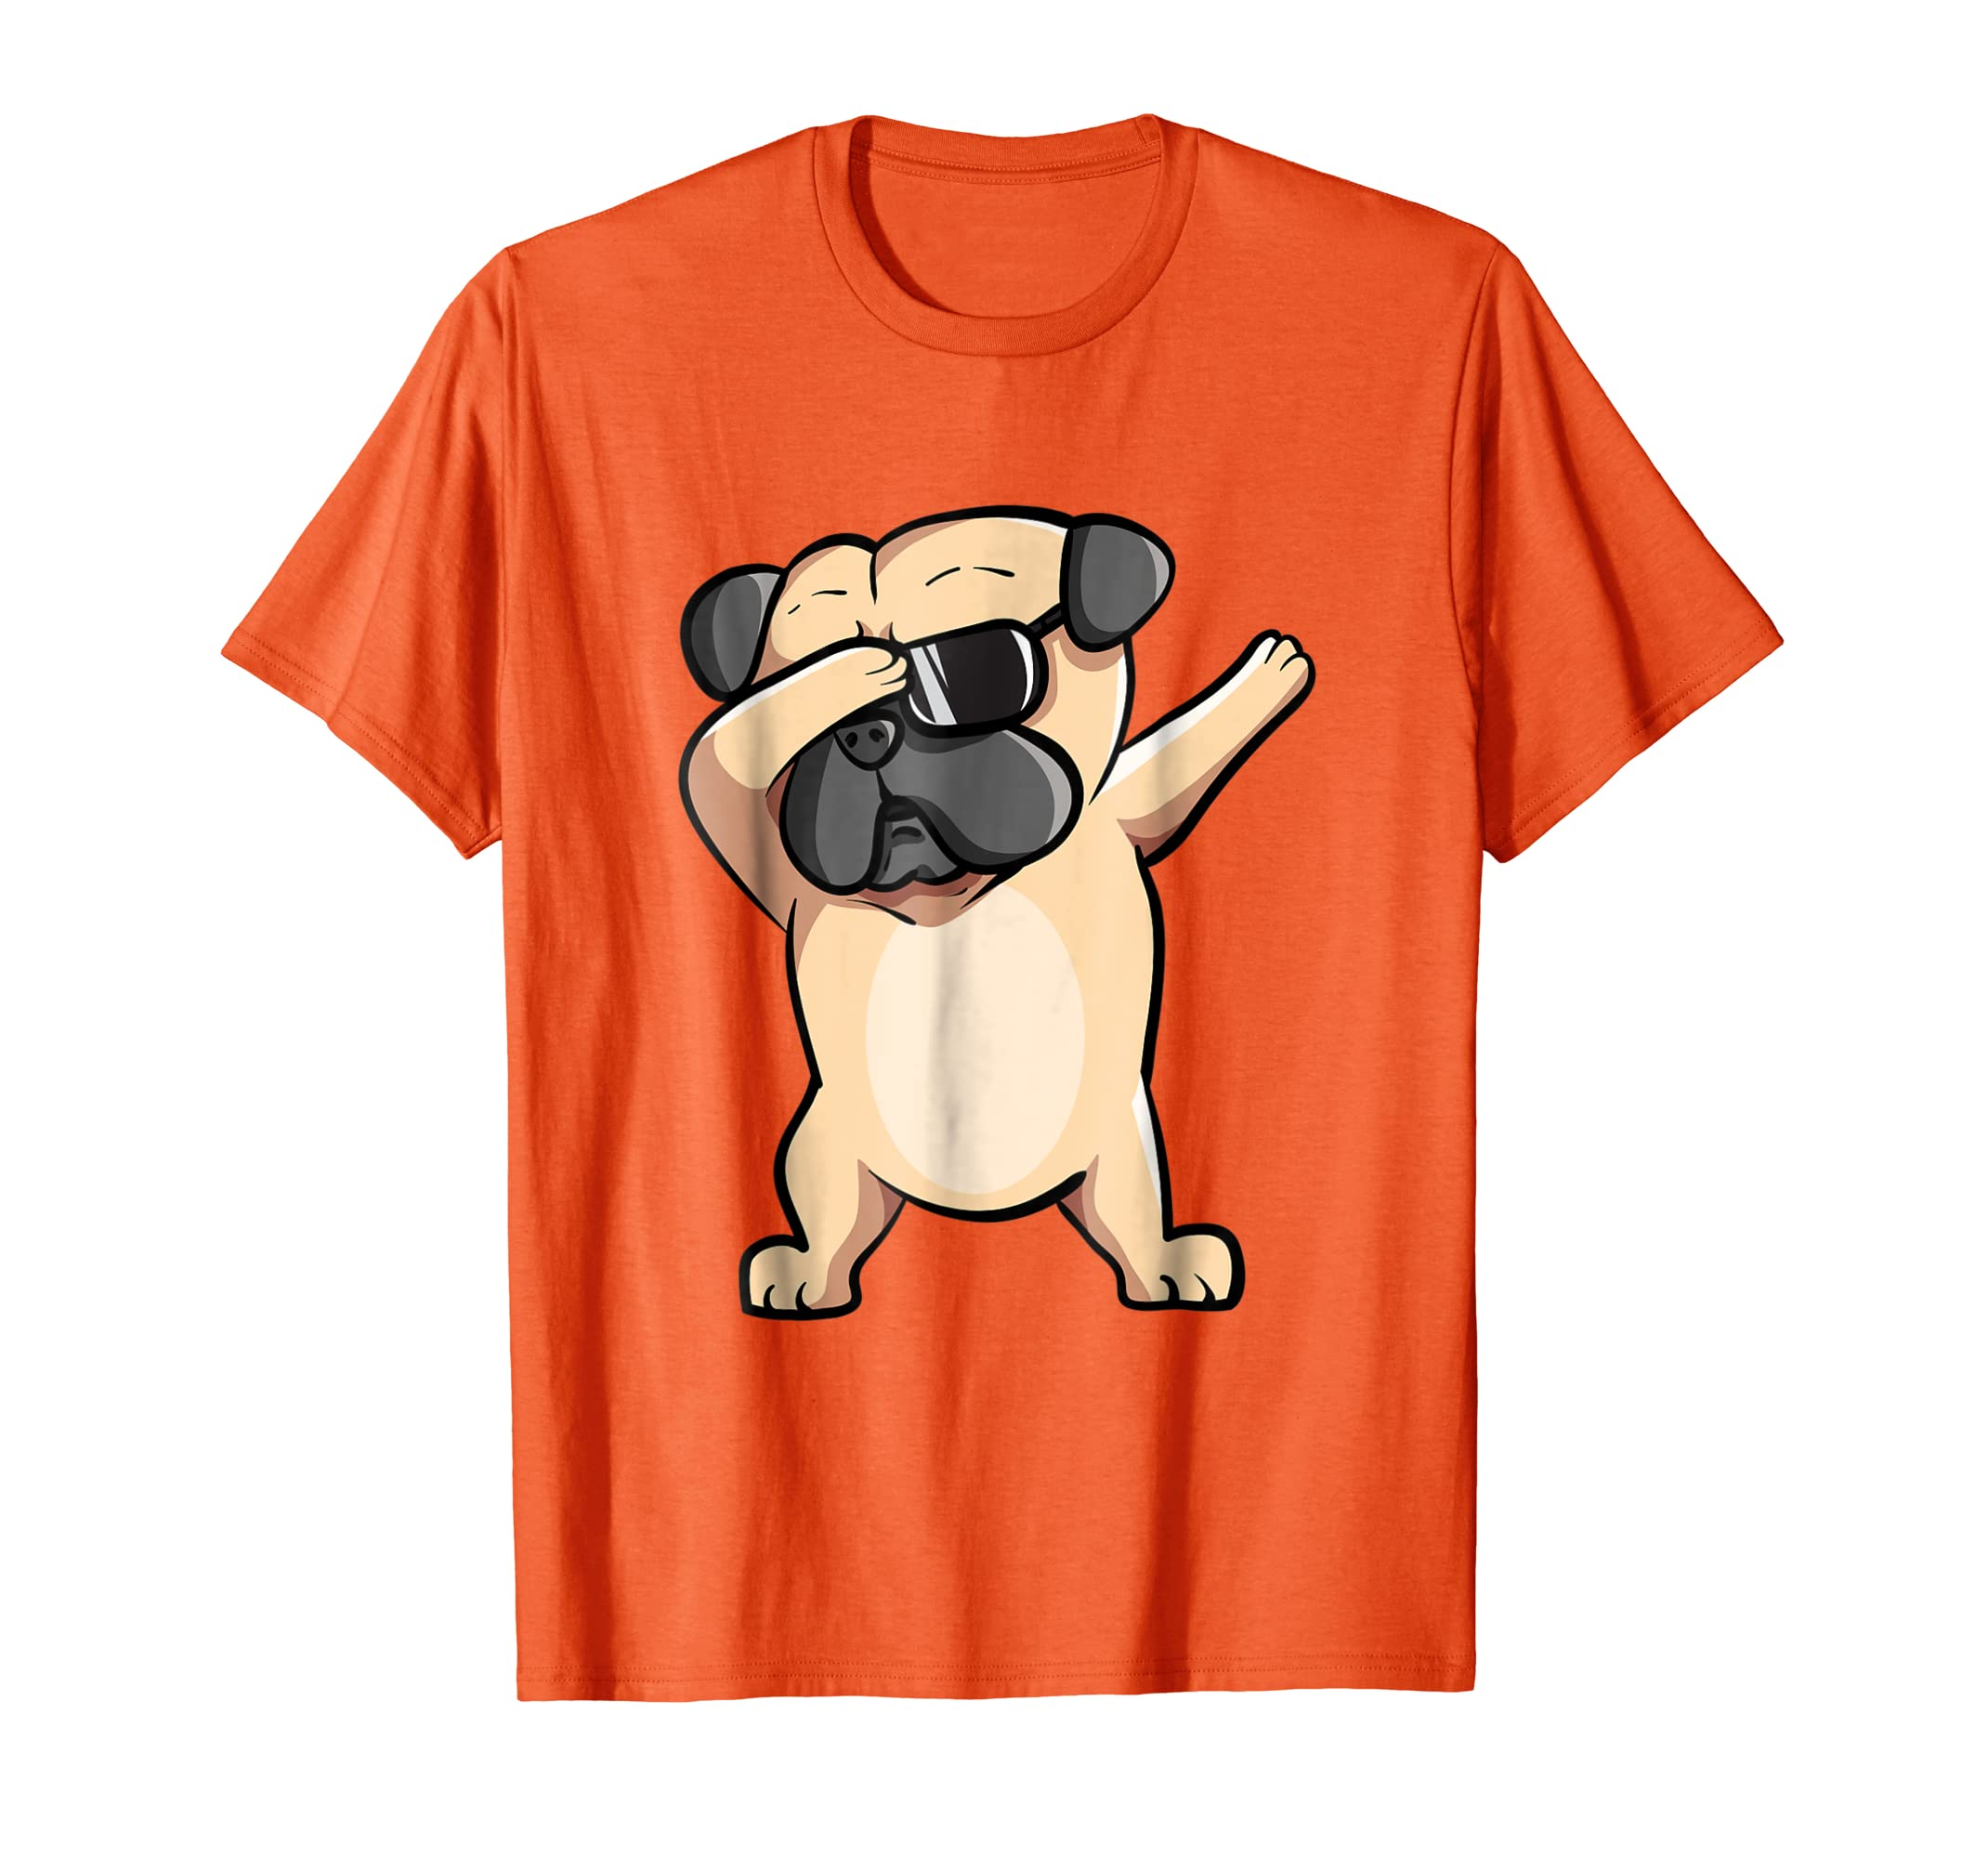 Cool Dabbing Pug Tee Shirt - Funny Dog Dab Orange T-Shirt-AZP